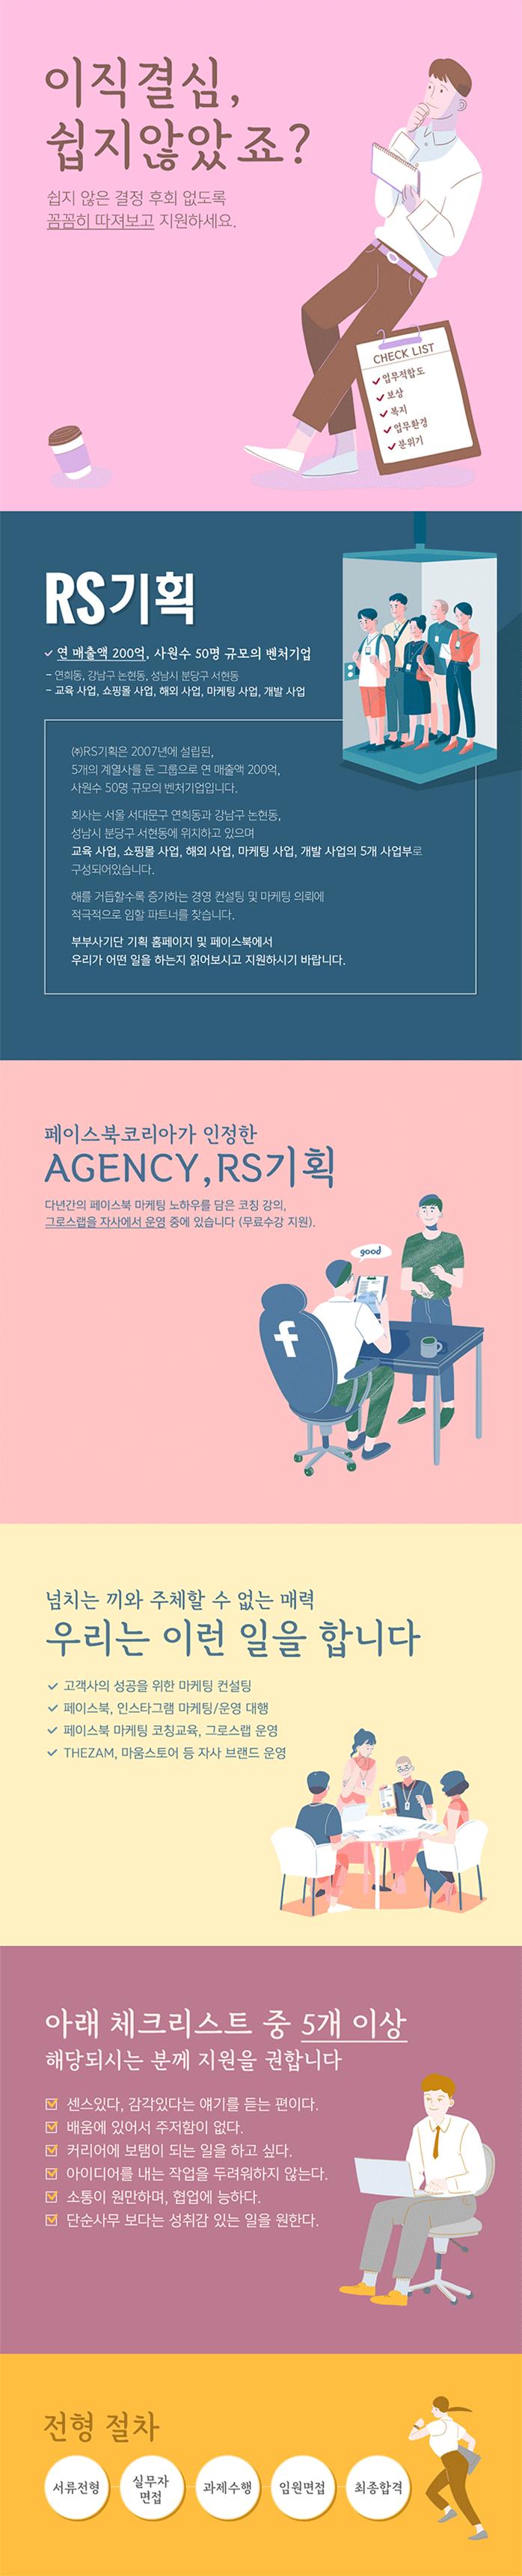 [RS기획] AE·개발·전략기획·영상·SNS·비서 부문별 경력사원 채용